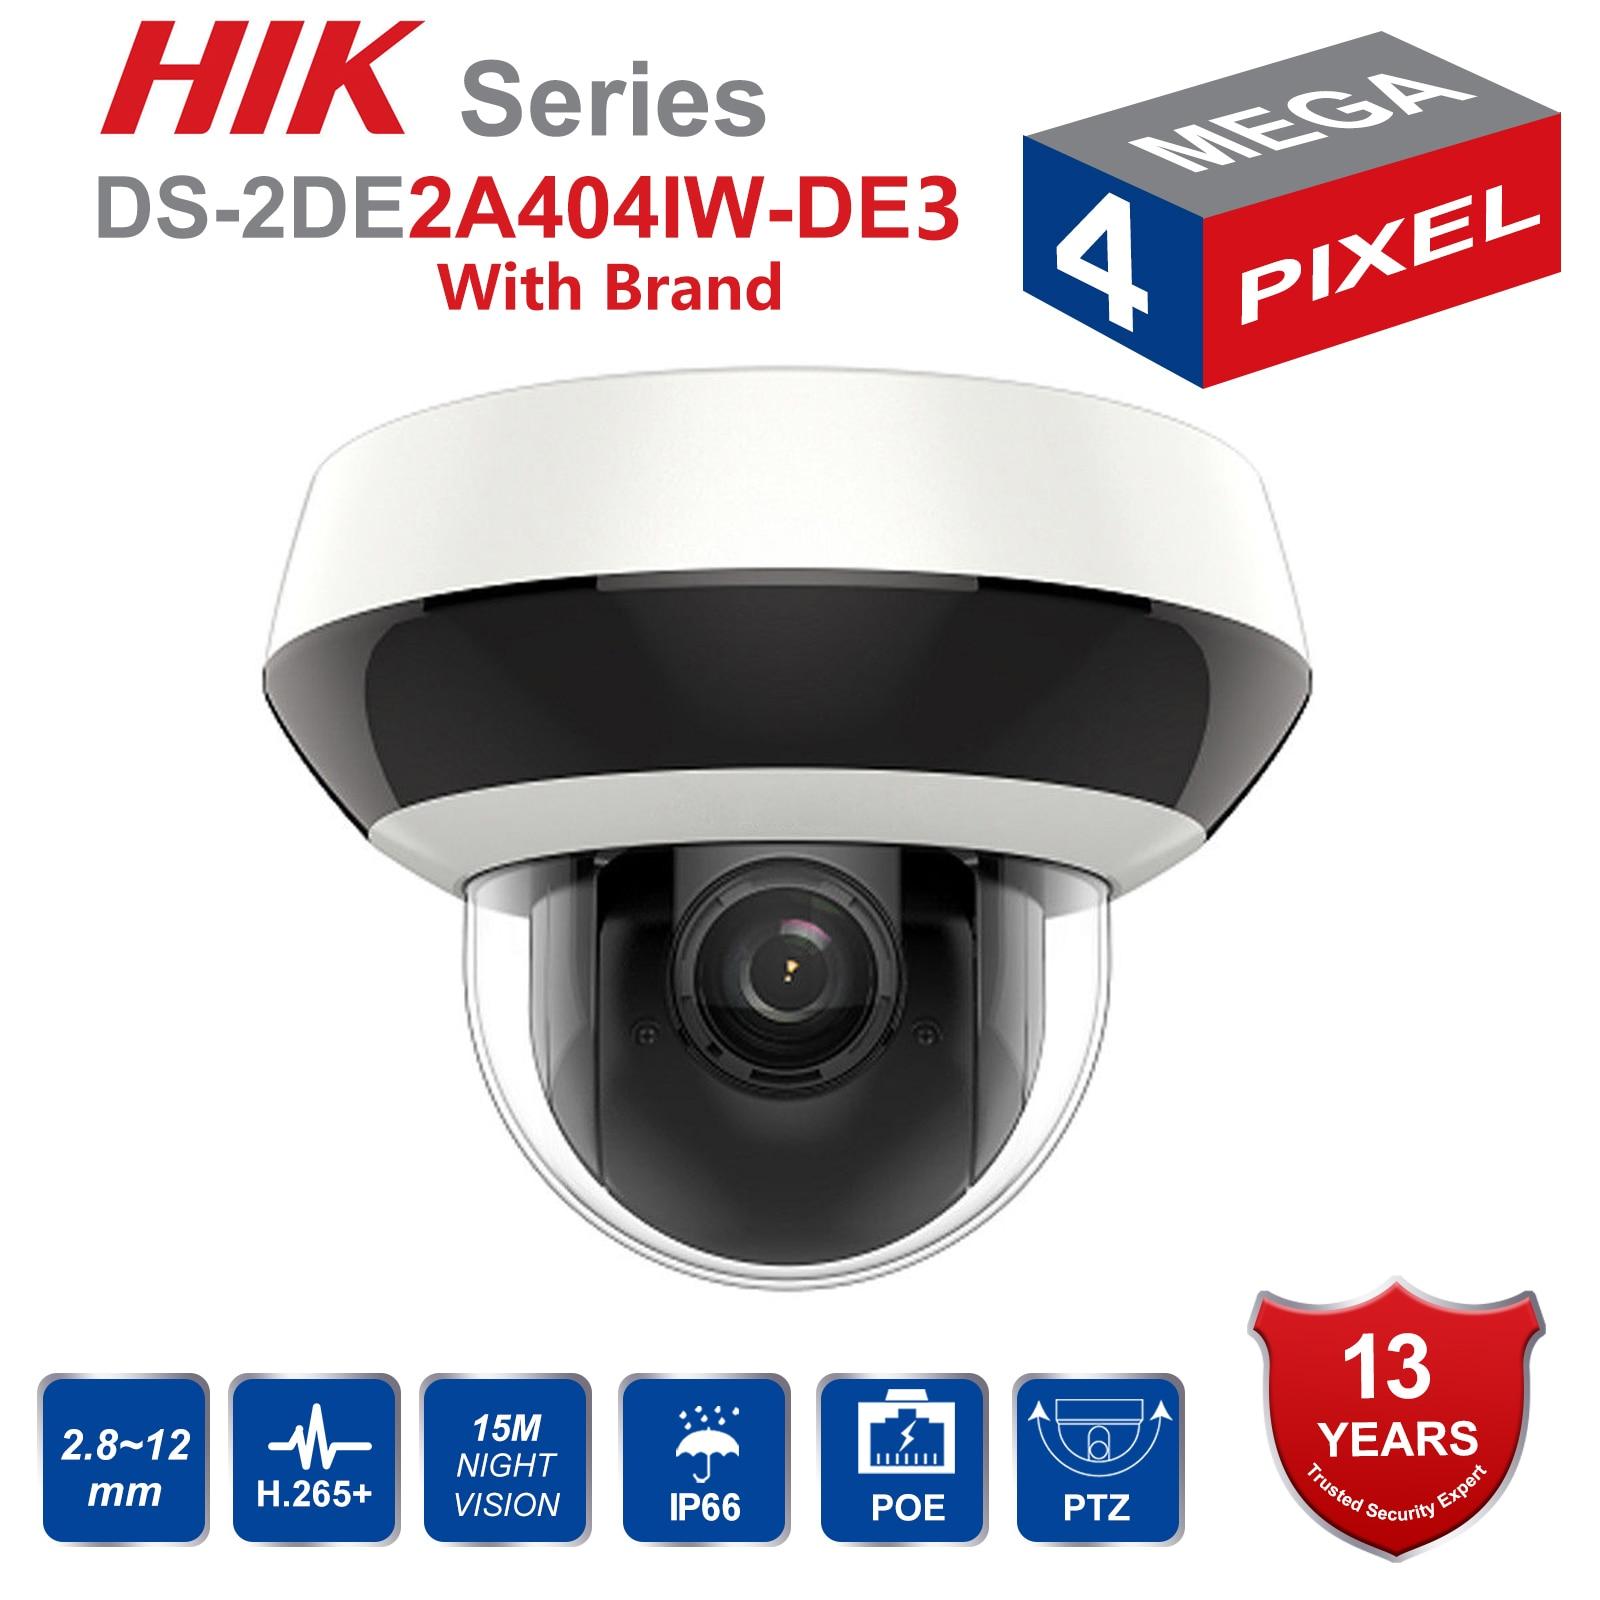 Hik câmera ip ptz h.265 DS-2DE2A404IW-DE3 4mp 4x zoom 2.8-12mm lente de rede de vigilância por vídeo poe dome cctv câmera áudio